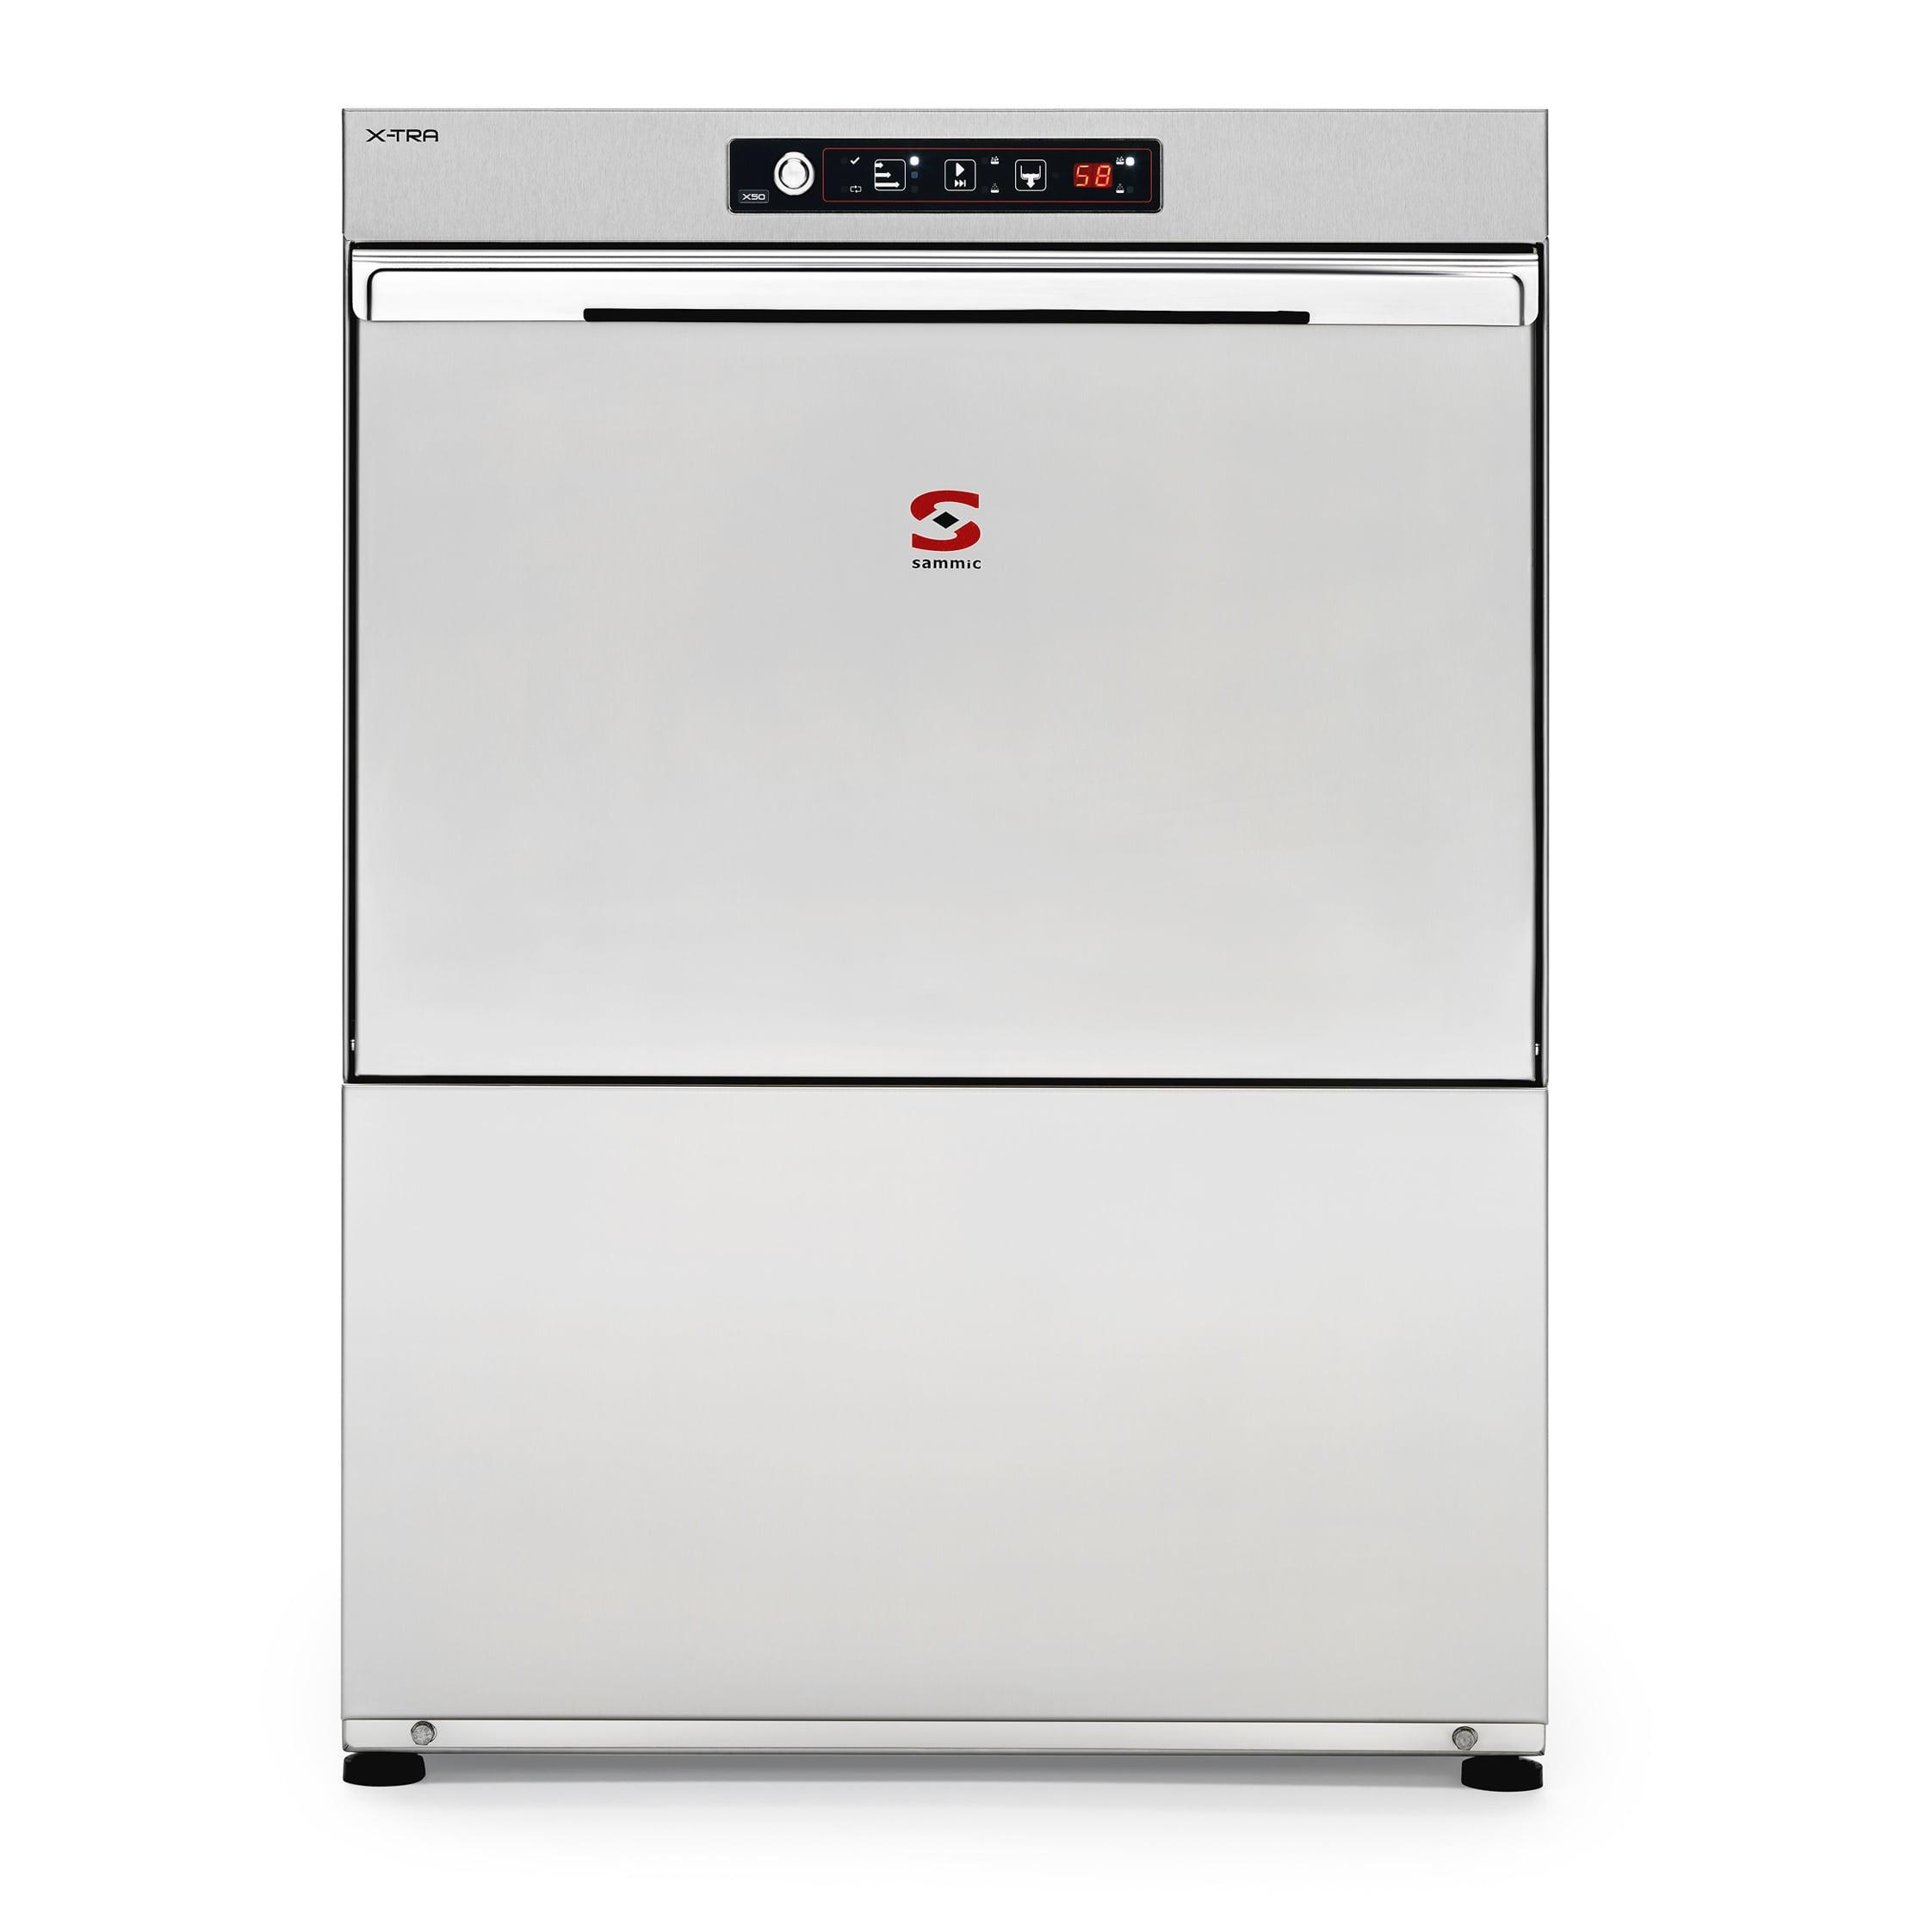 Máquina de Lavar Louças Industrial x-50 - SAMMIC - 220V TRIFÁSICO